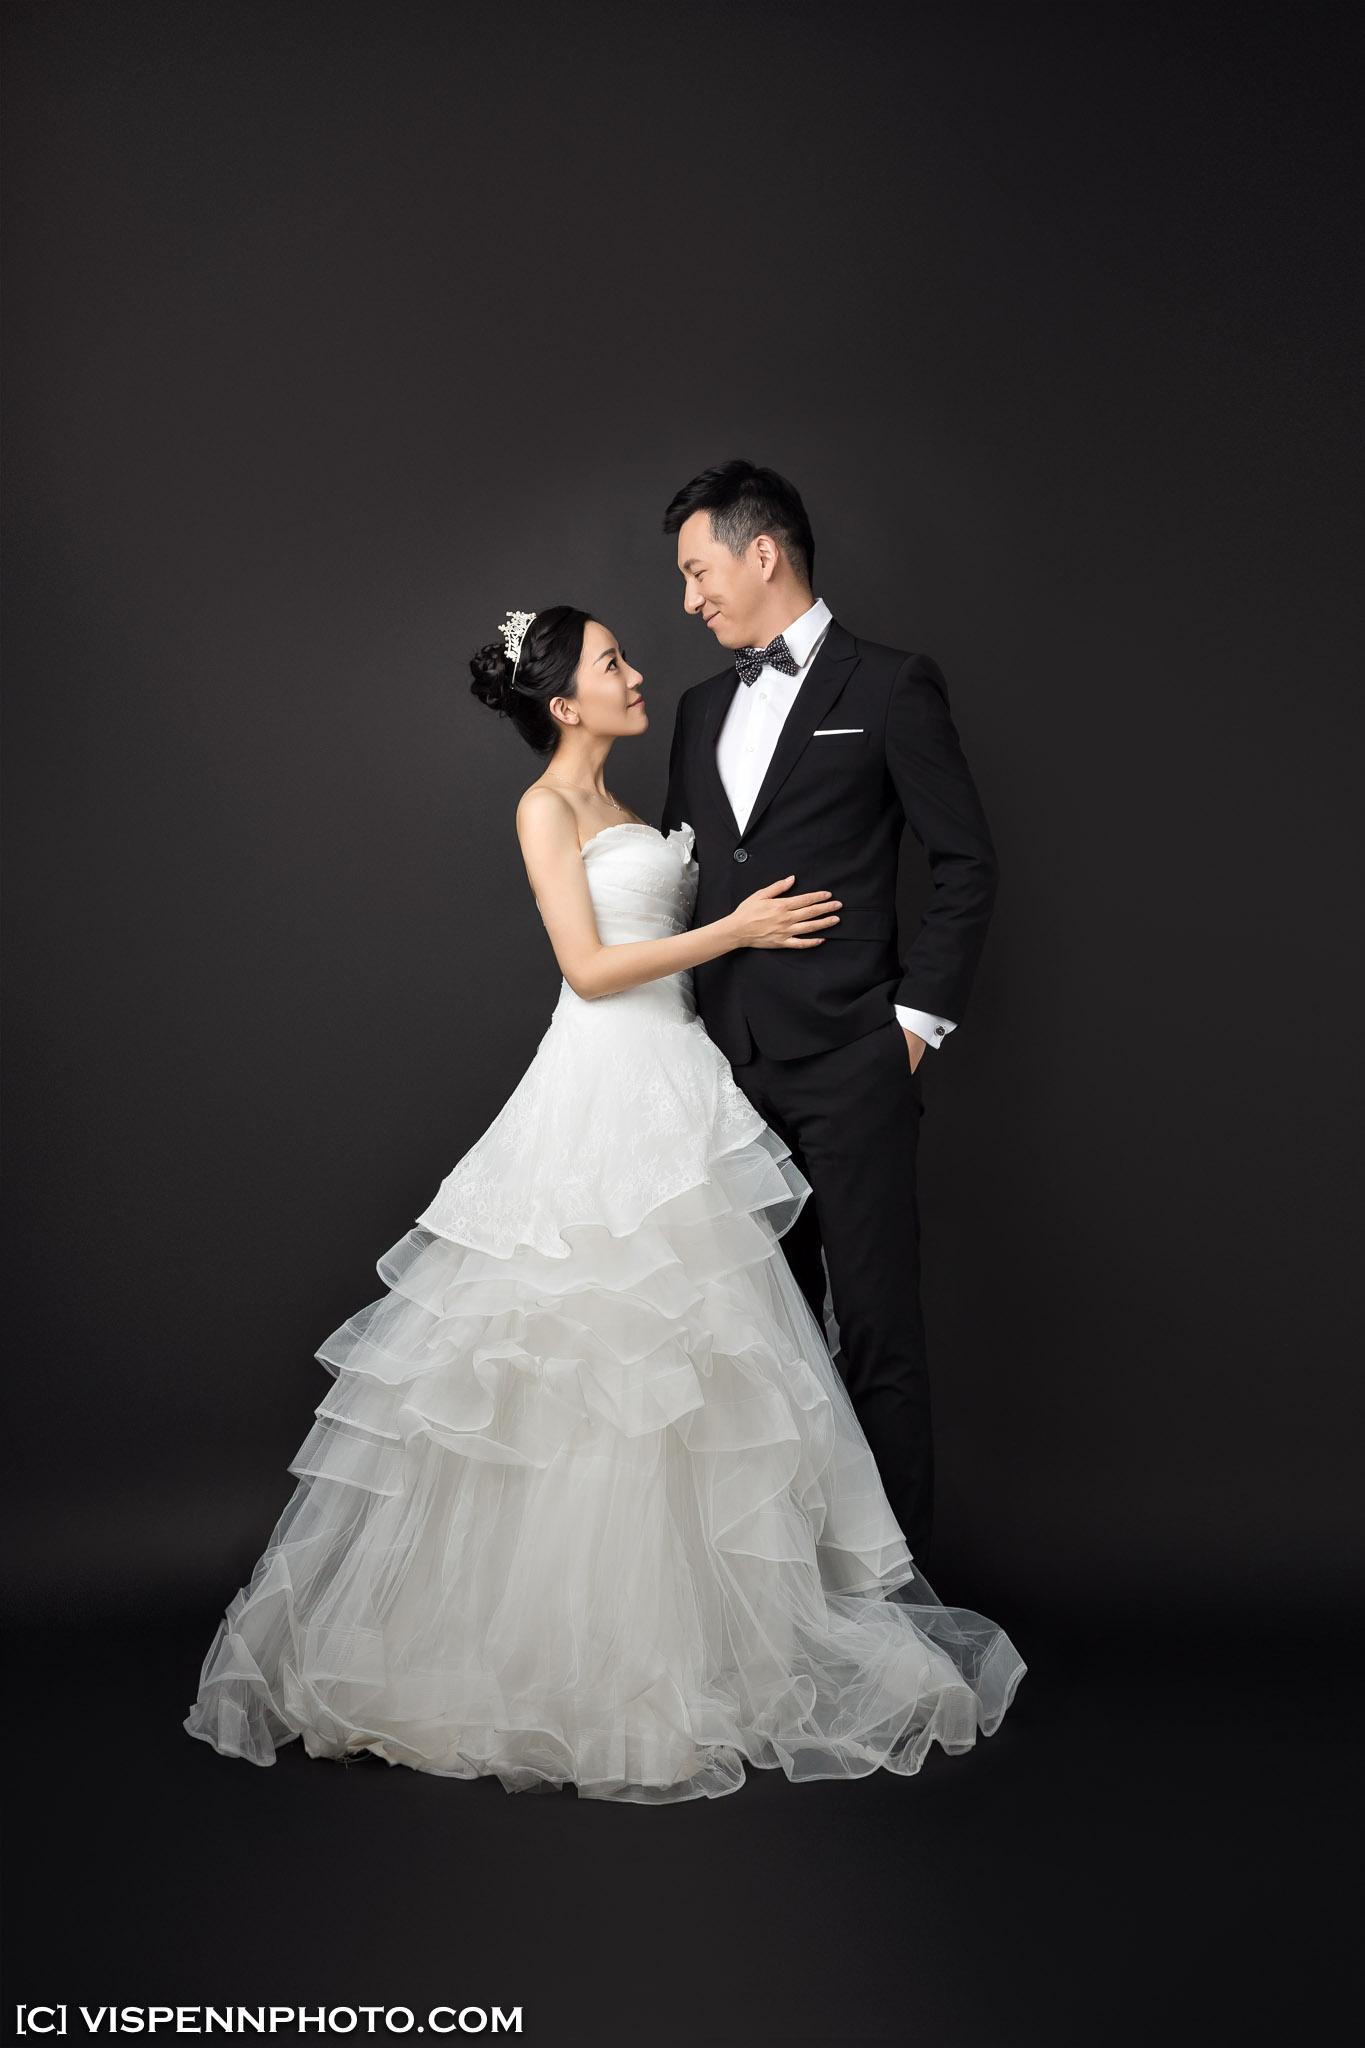 PRE WEDDING Photography Melbourne VISPENN 墨尔本 婚纱照 结婚照 婚纱摄影 5DB 0630